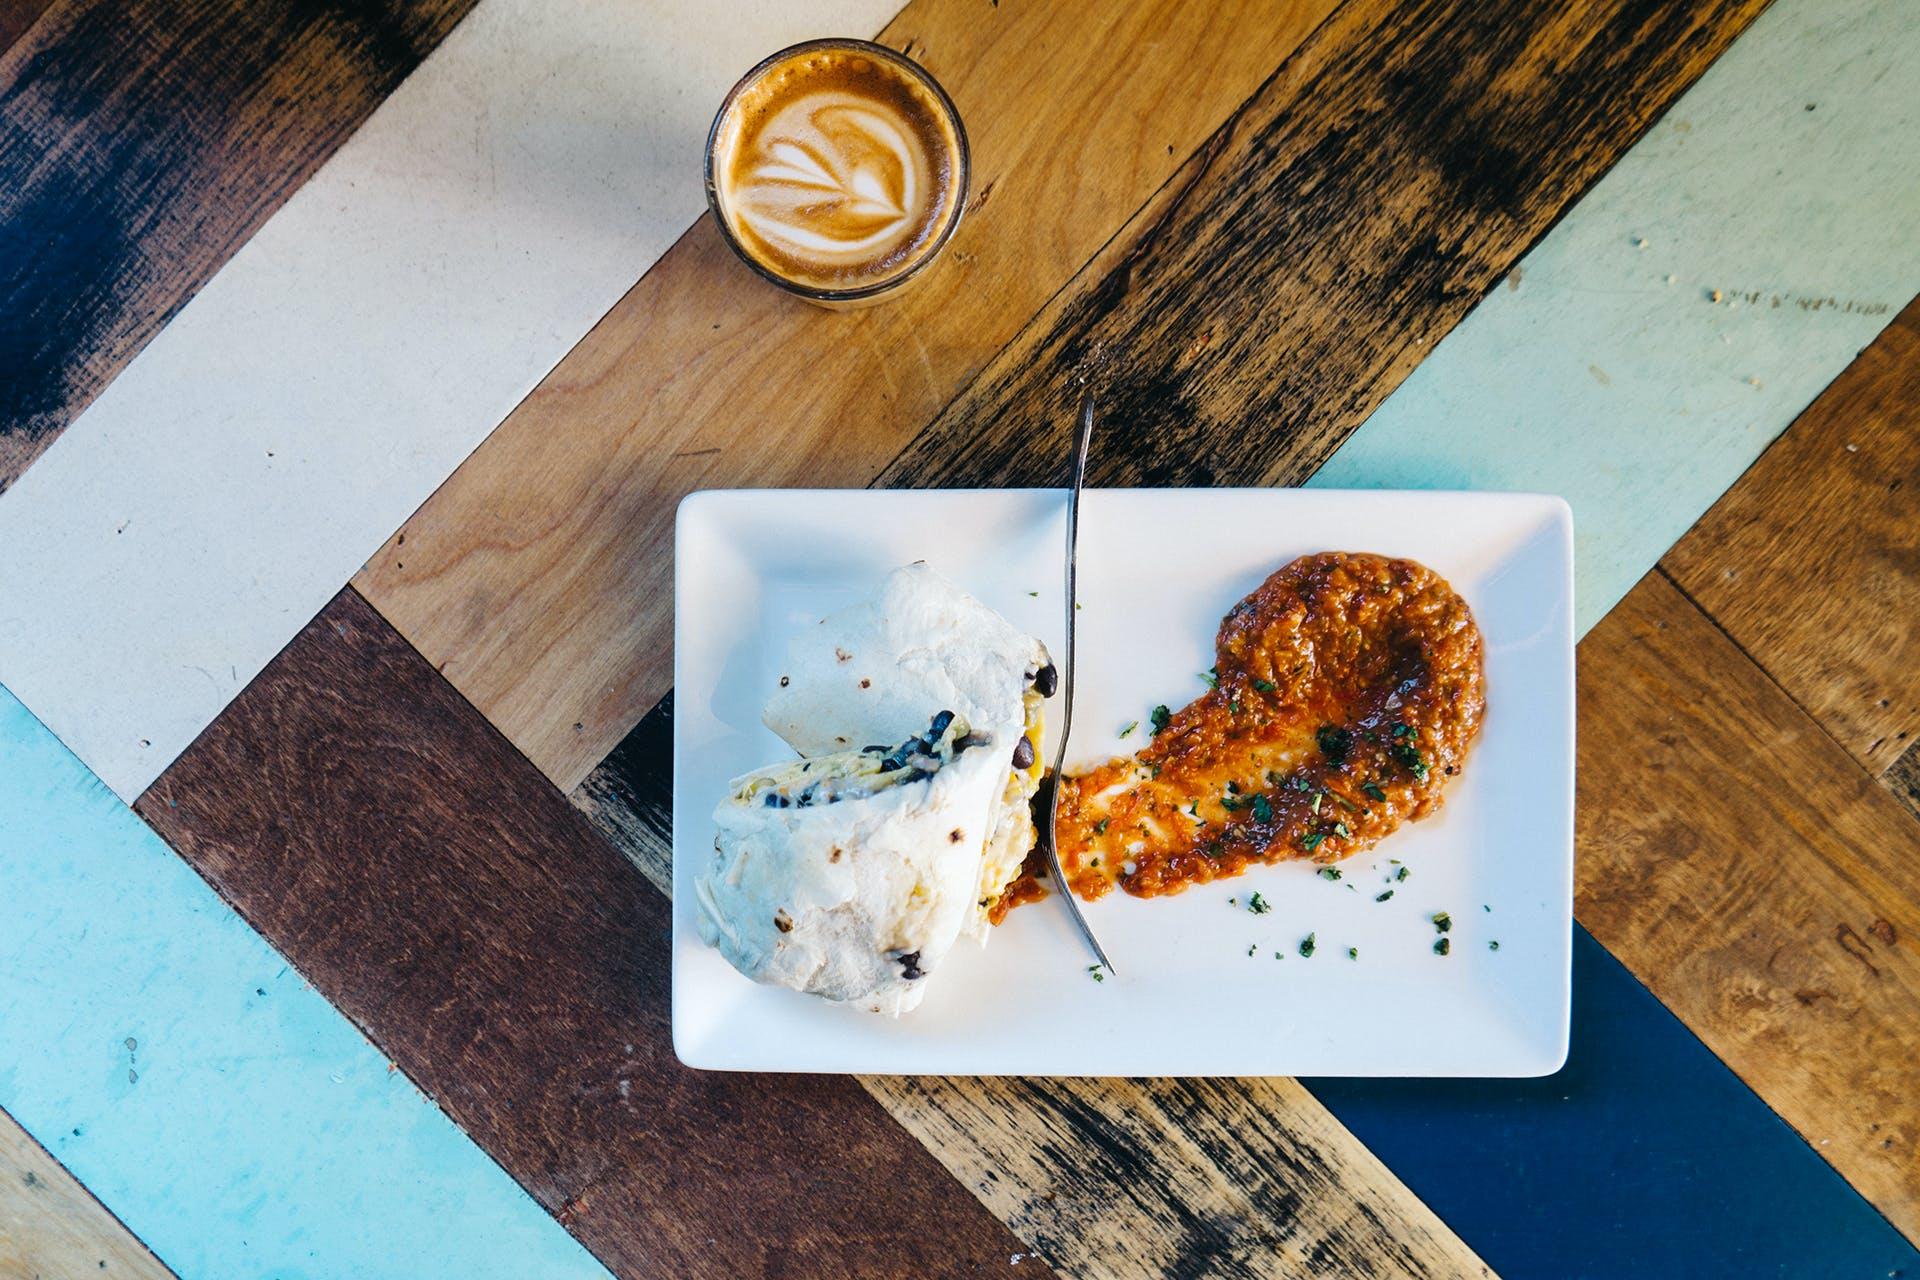 Free stock photo of food, coffee, lunch, burrito